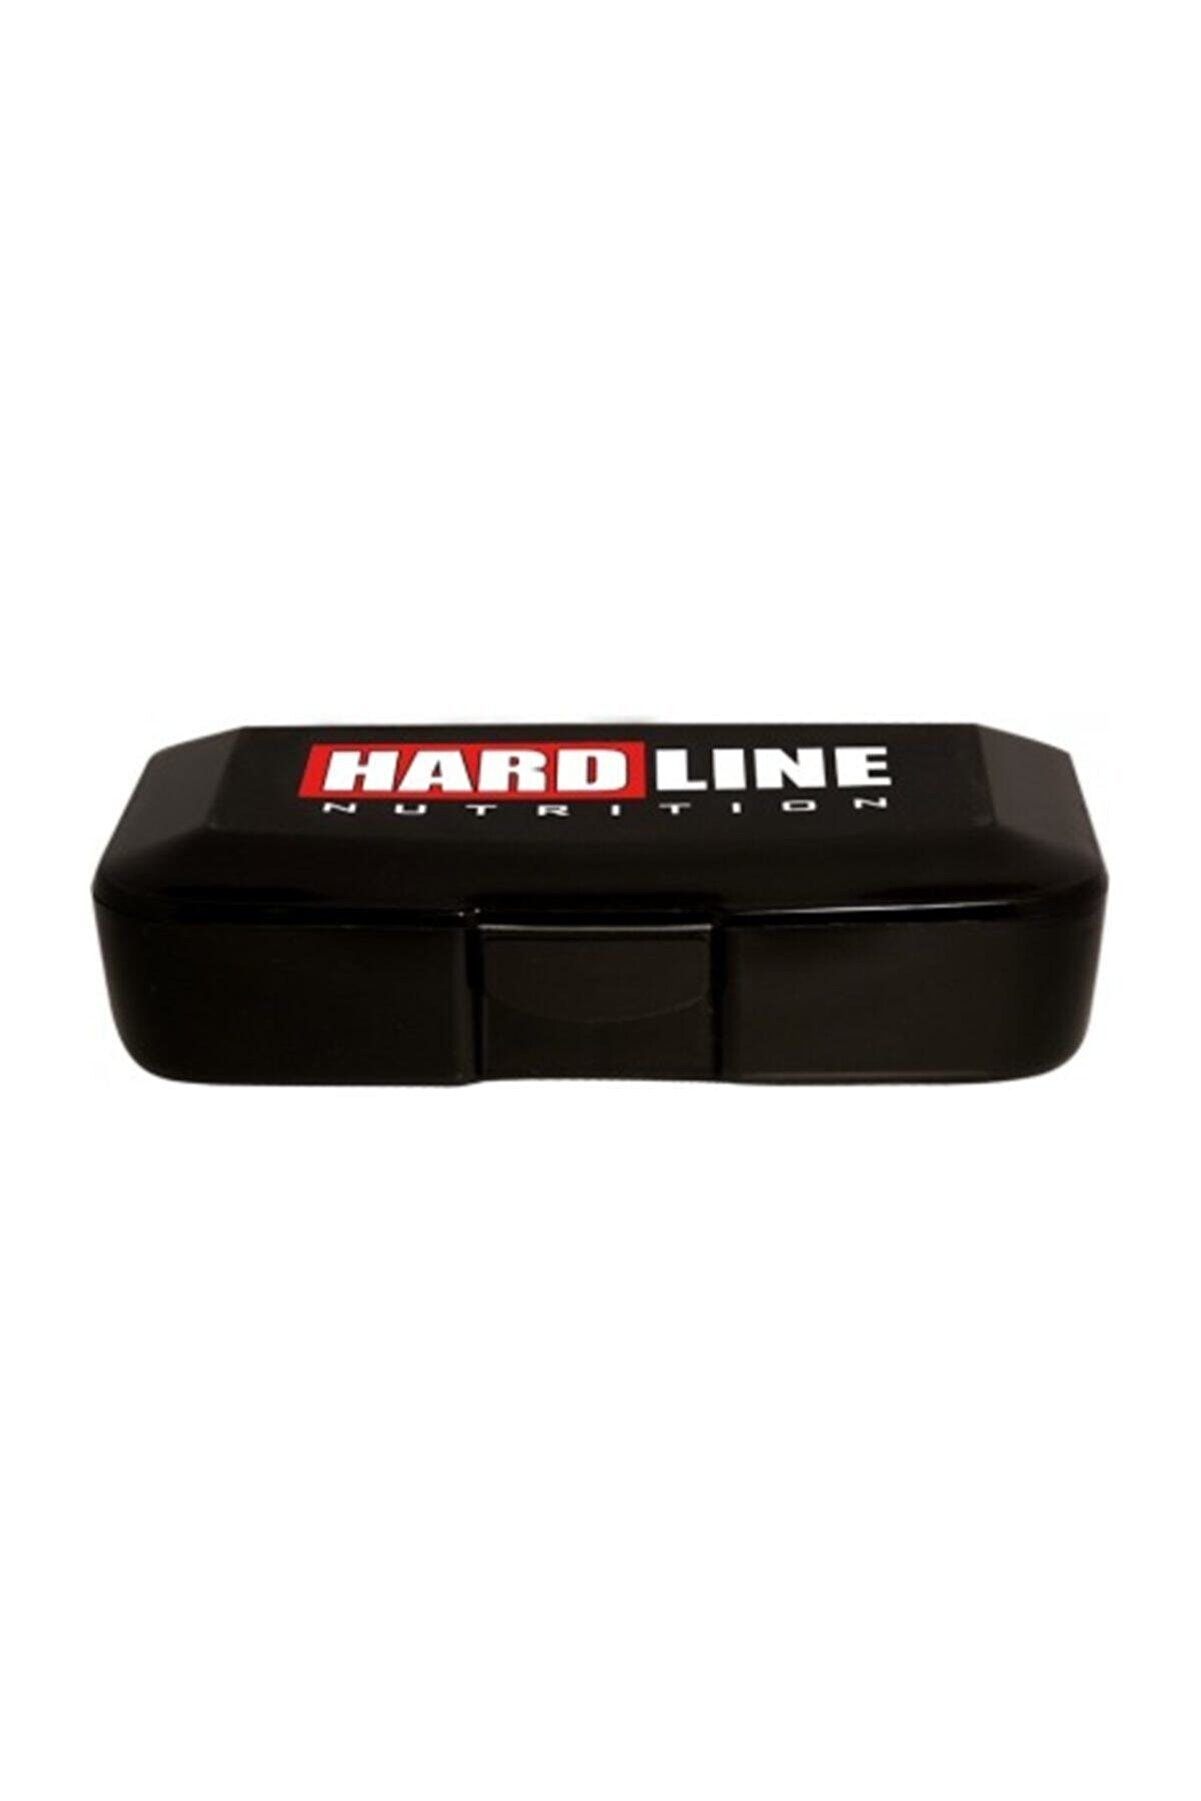 Hardline Pillbox Saklama Kutusu